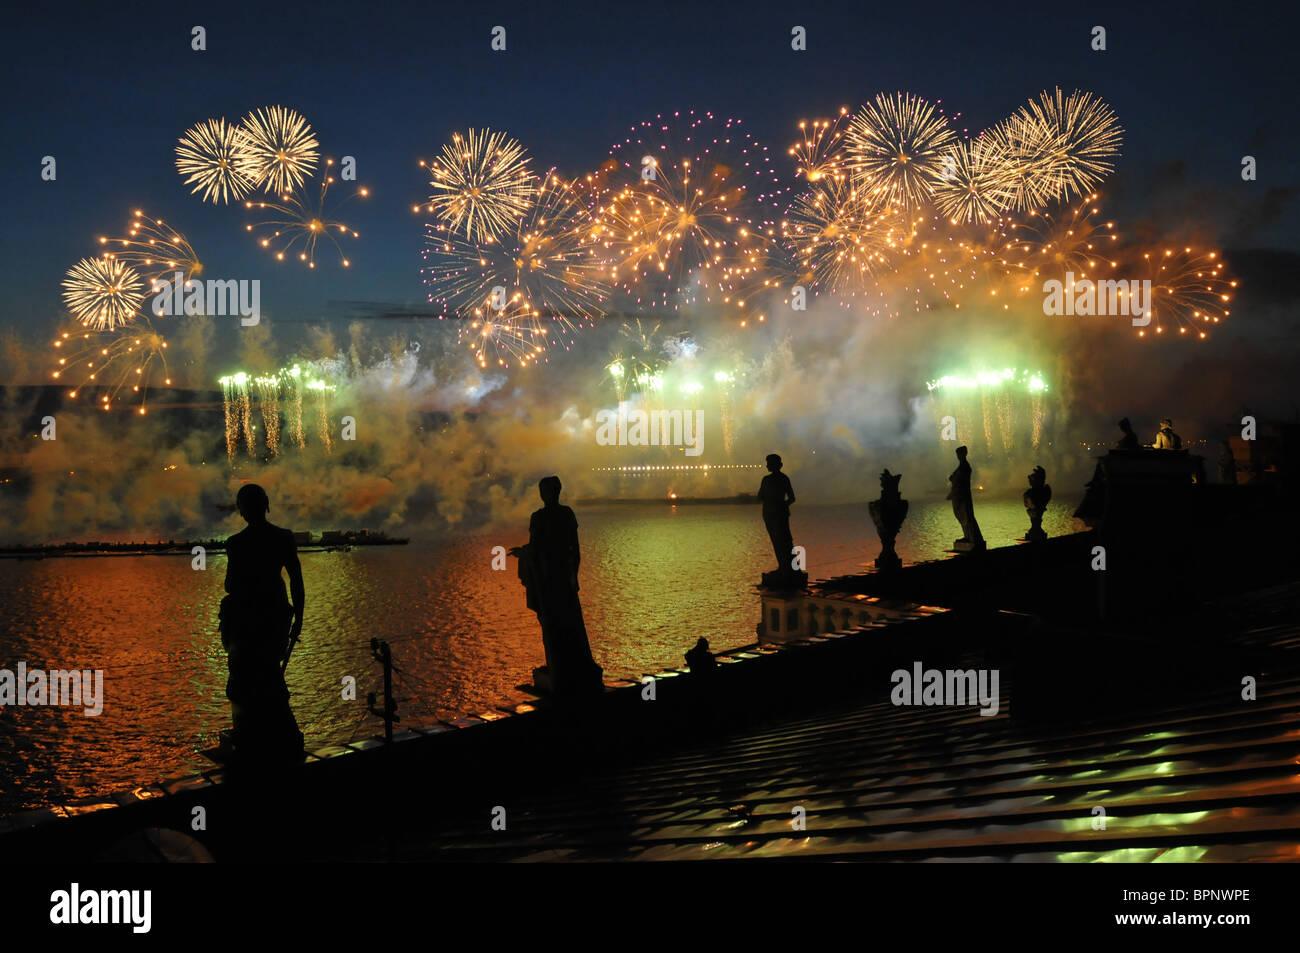 Festivities 'Scarlet Sails' celebrating school graduation in St. Petersburg - Stock Image